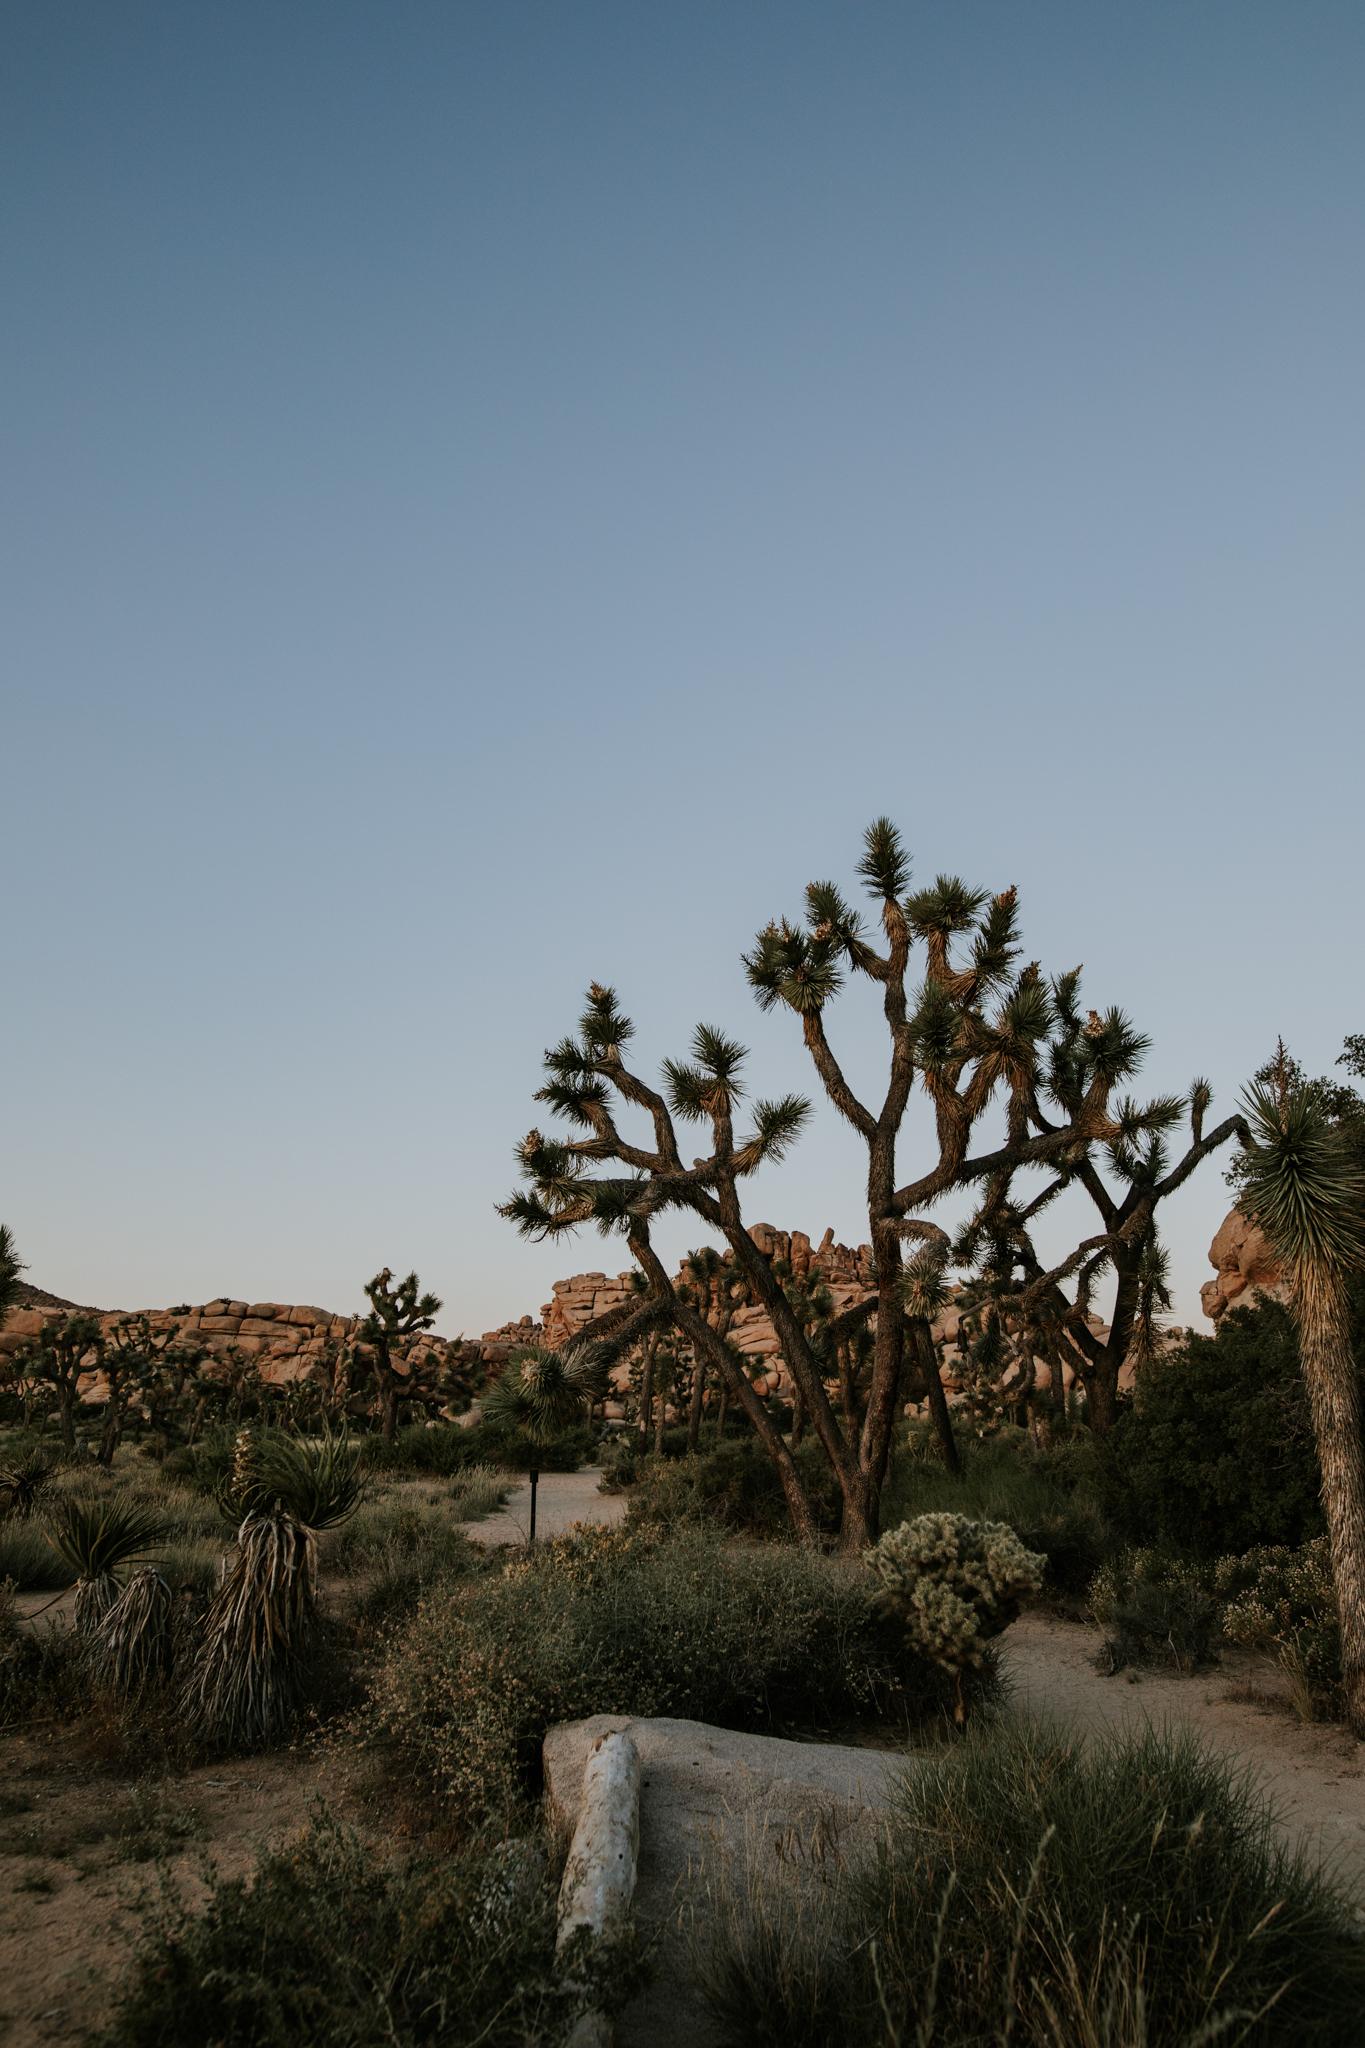 Joshua Tree Elopement Photographer - Vow of the Wild